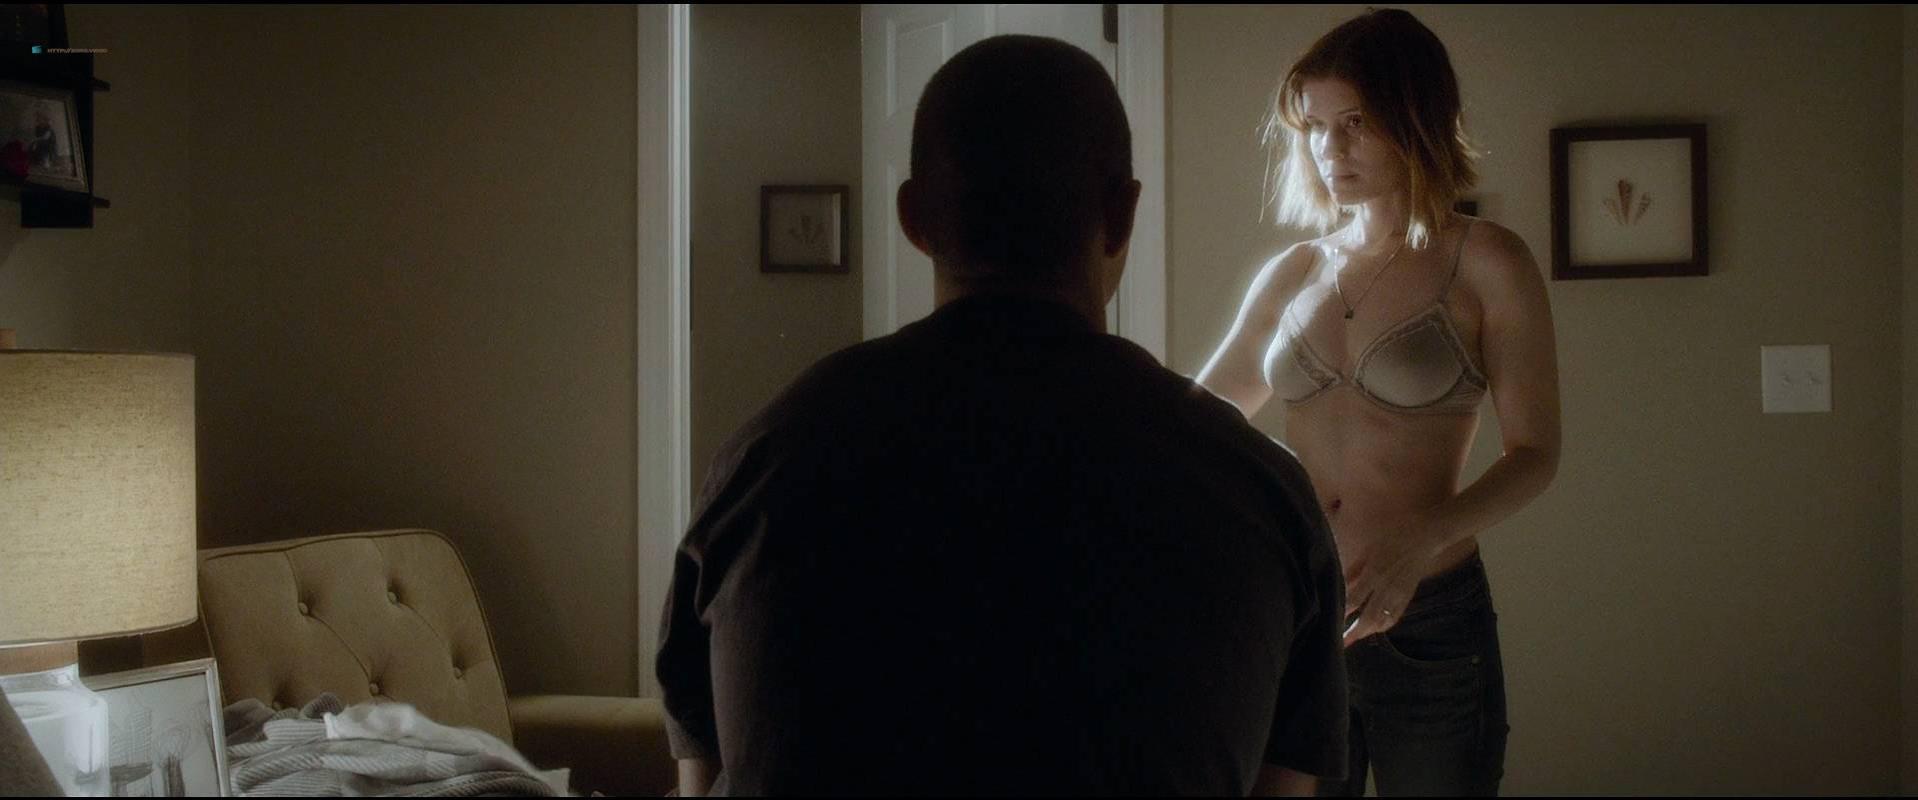 Kate Mara Naked Video photo 22